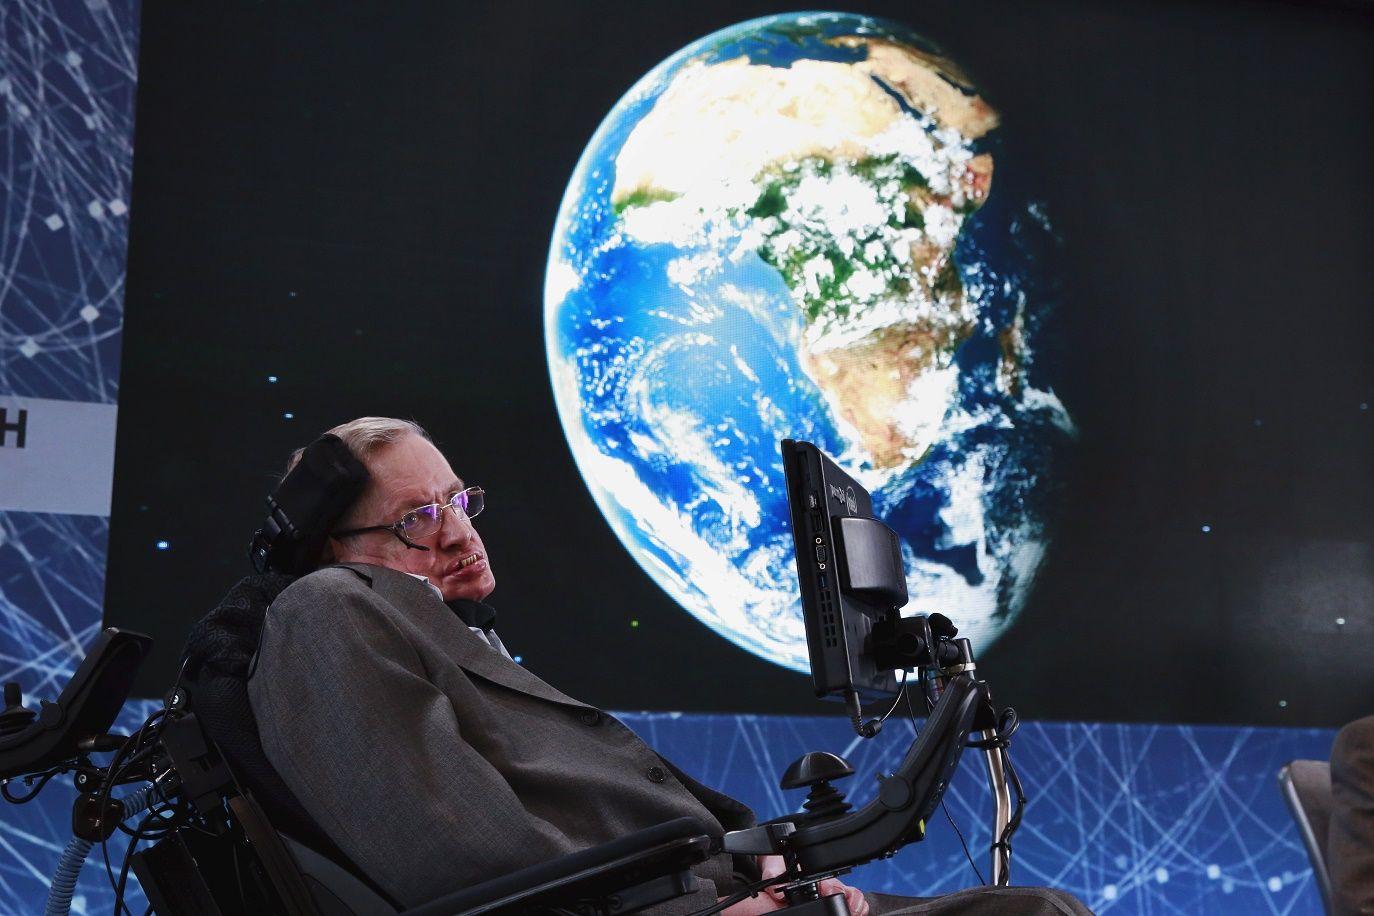 Stephen Hawking climate change threat